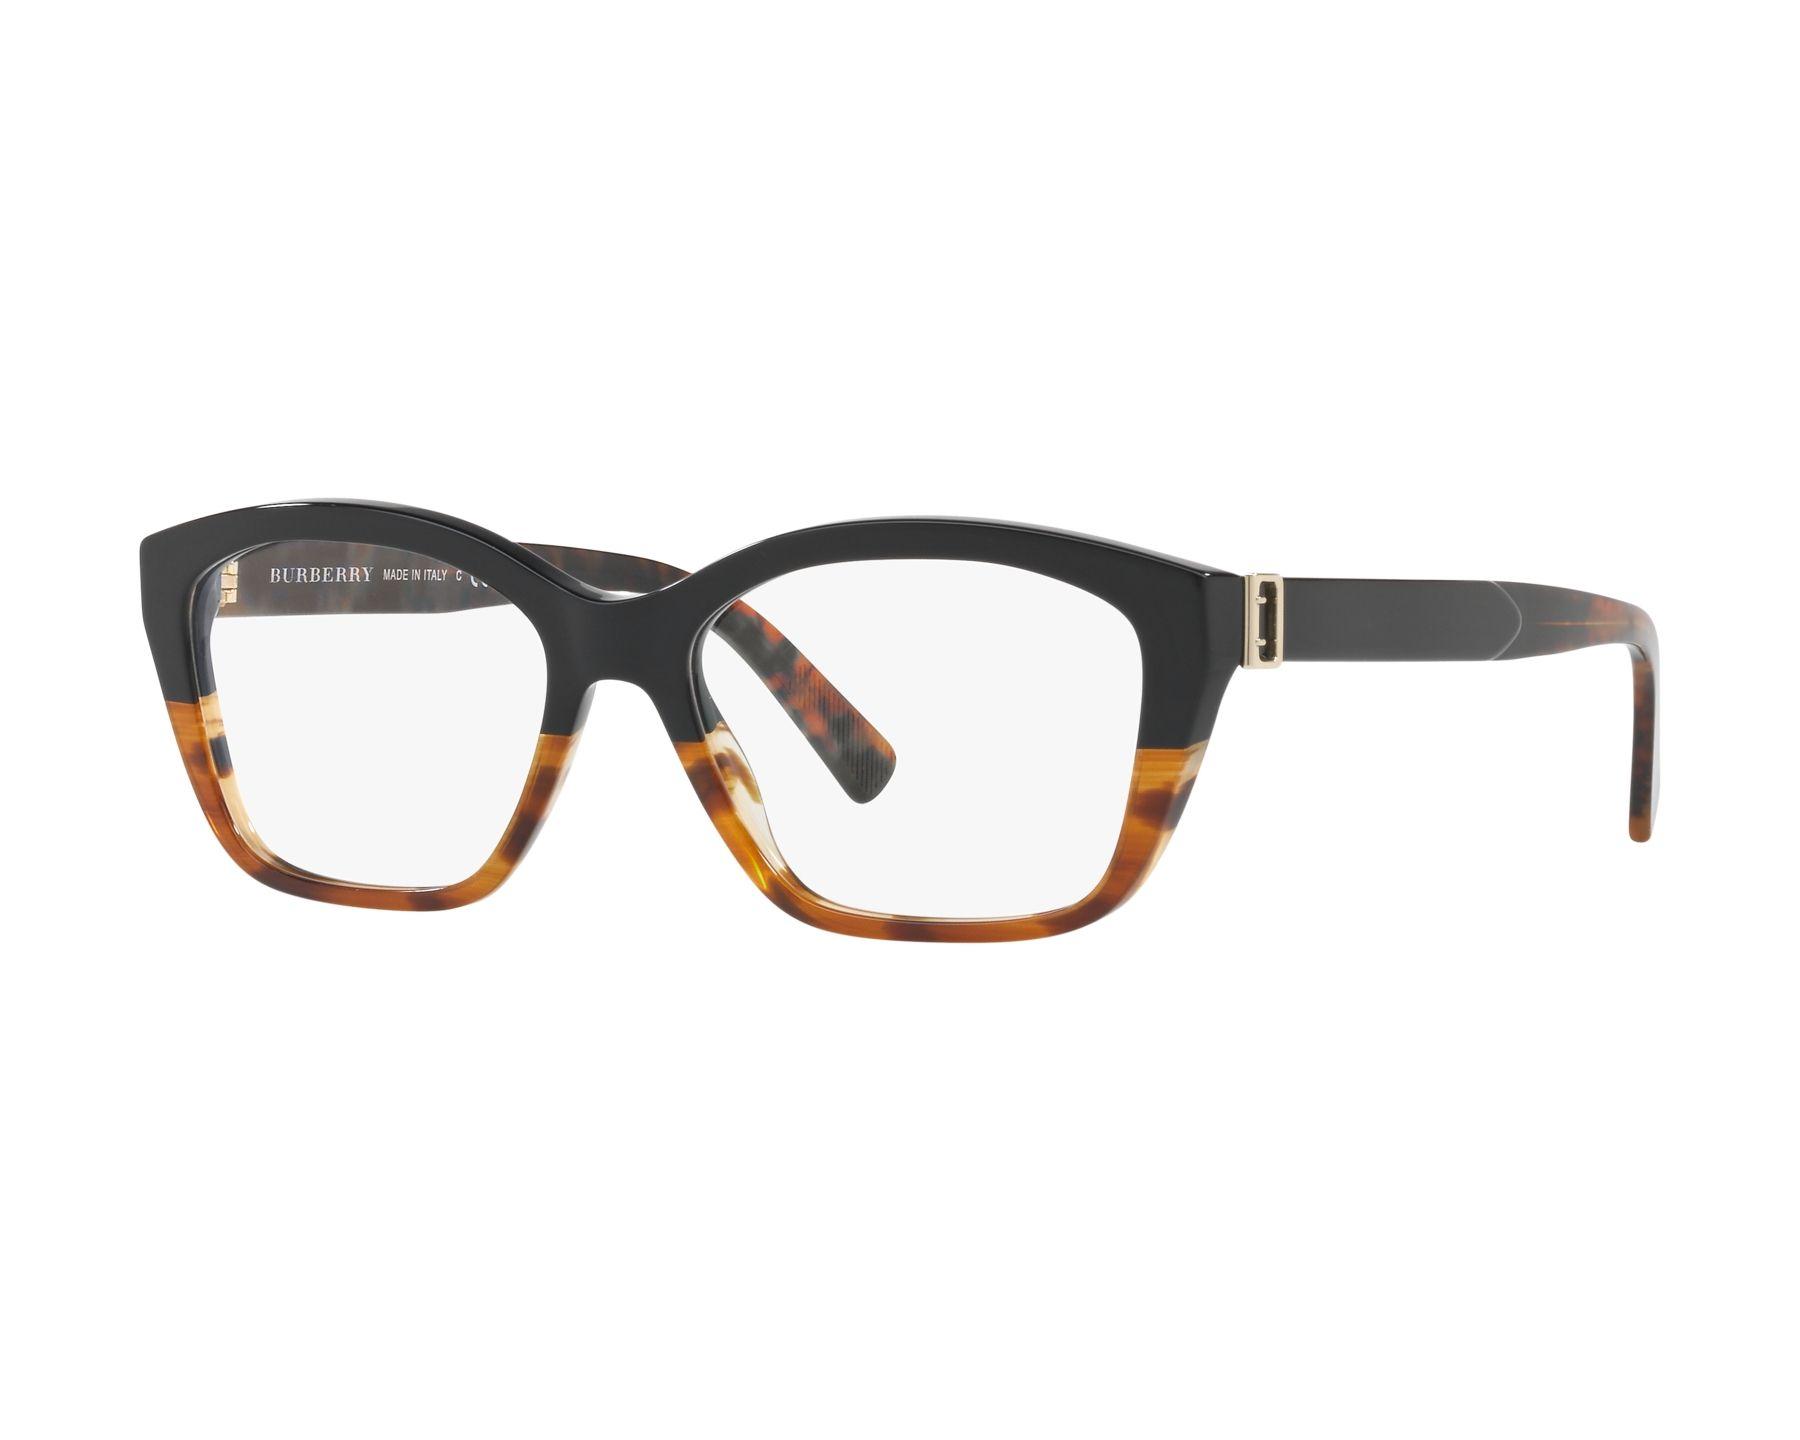 acdad87c3bec Burberry Eyeglasses